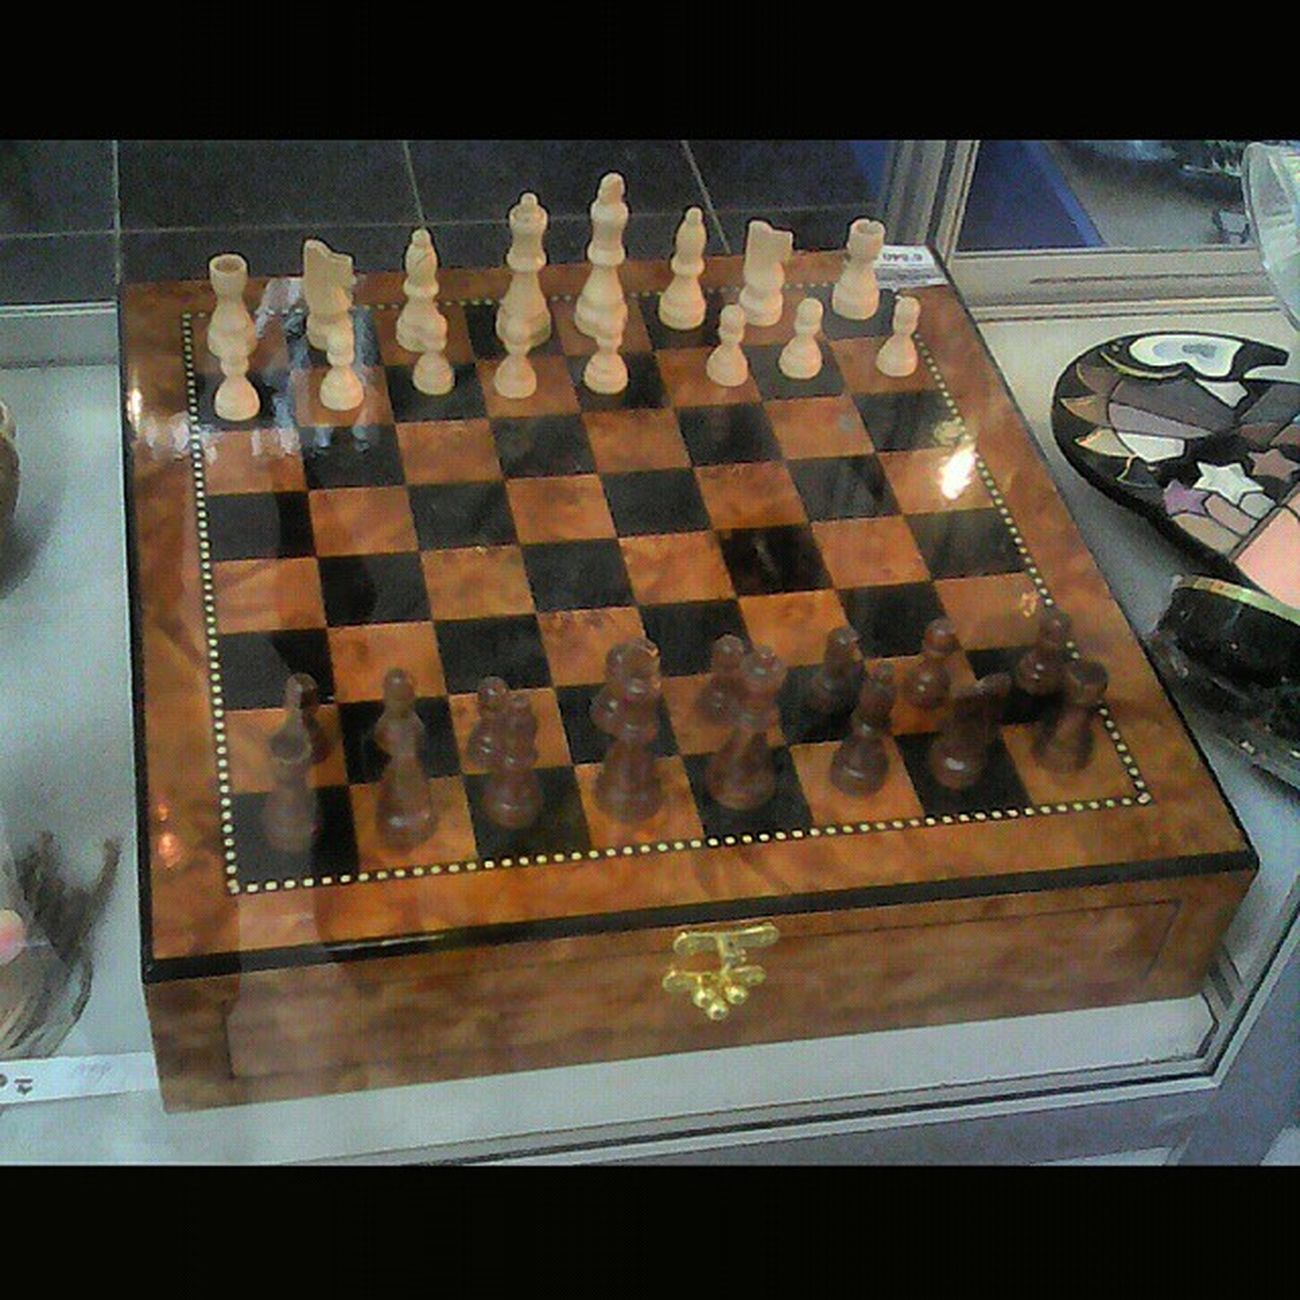 Шахматы красиво настольныеигры Squareinstapic